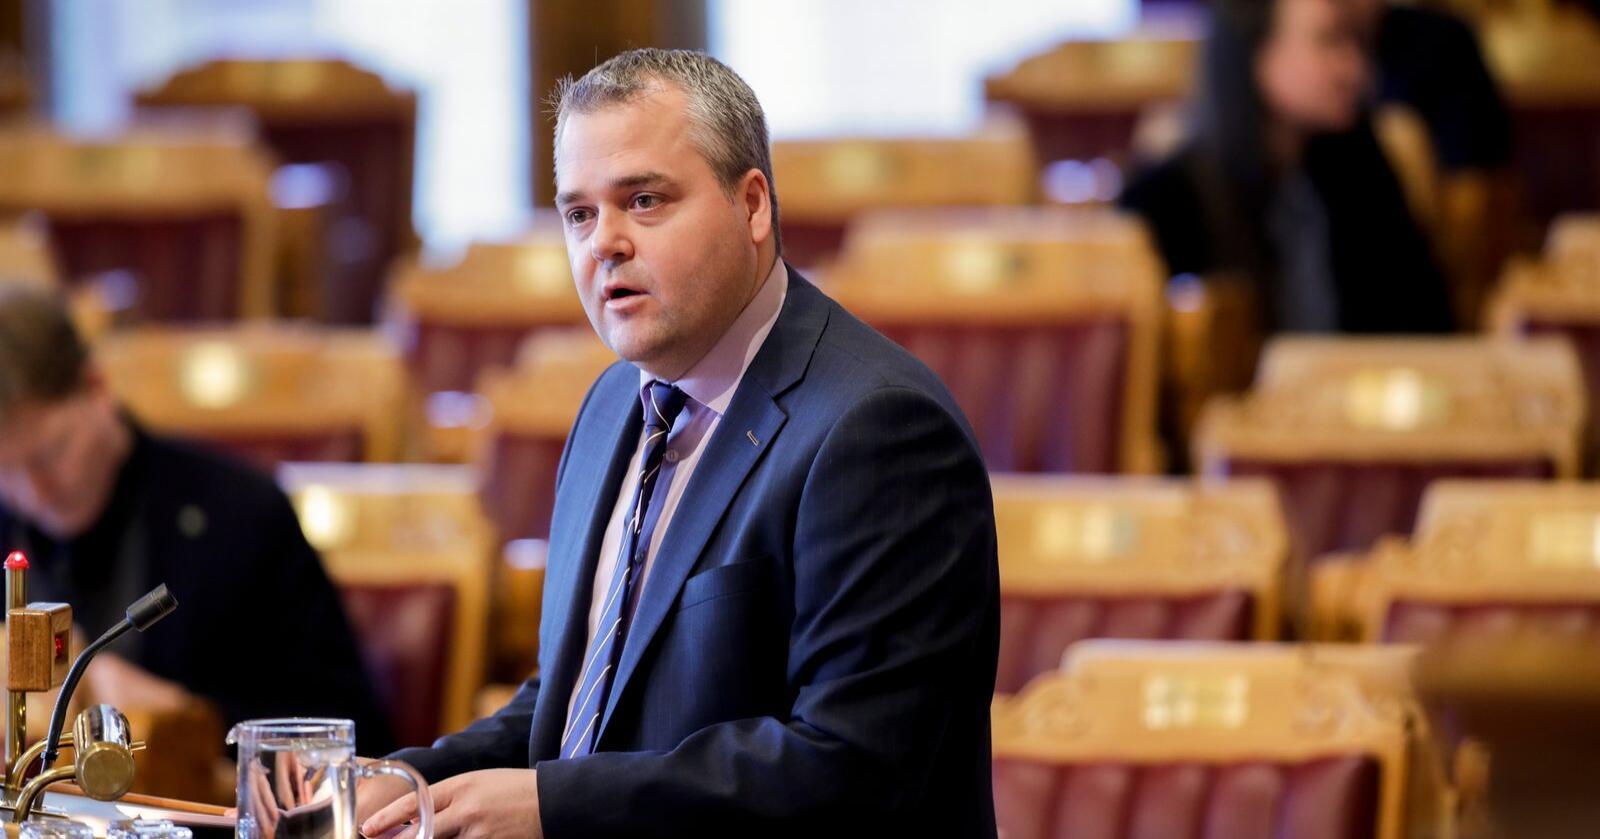 Roy Steffensen (Frp) er en av dem som i debatten i Stortinget torsdag fortalte at han har hatt det vanskelig med at partiet hans var med på å legge ned pelsdyrnæringen. Her fra en tidligere debatt. Foto: Vidar Ruud / NTB